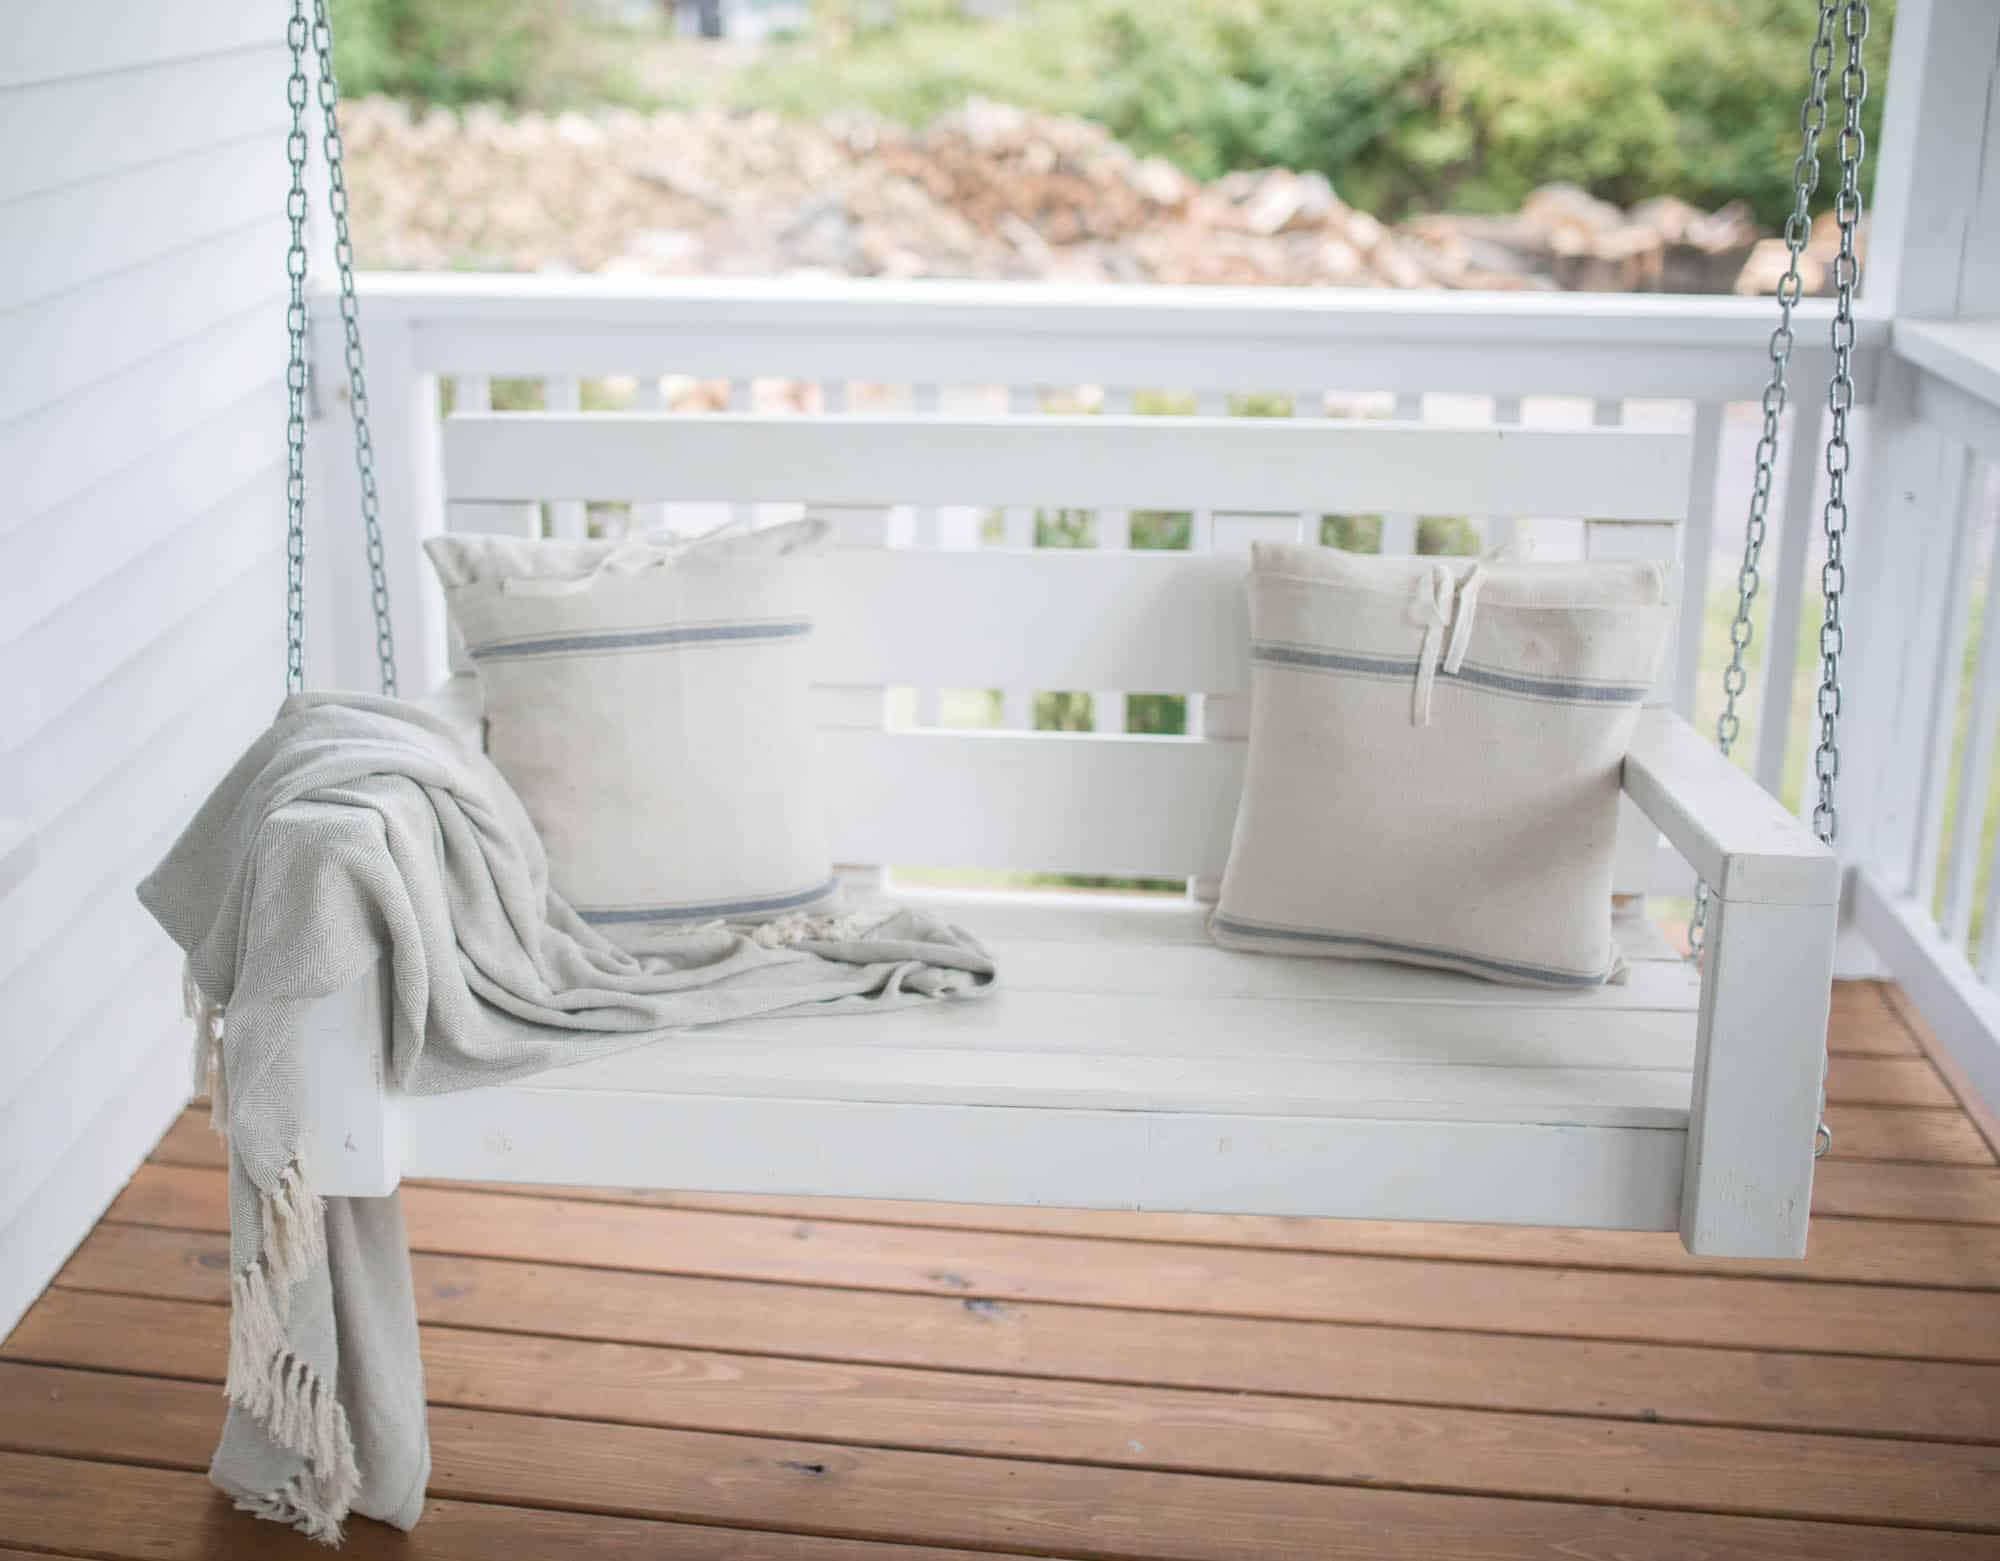 Fall Farmhouse Font Porch Swing with Grain Sack Pillows